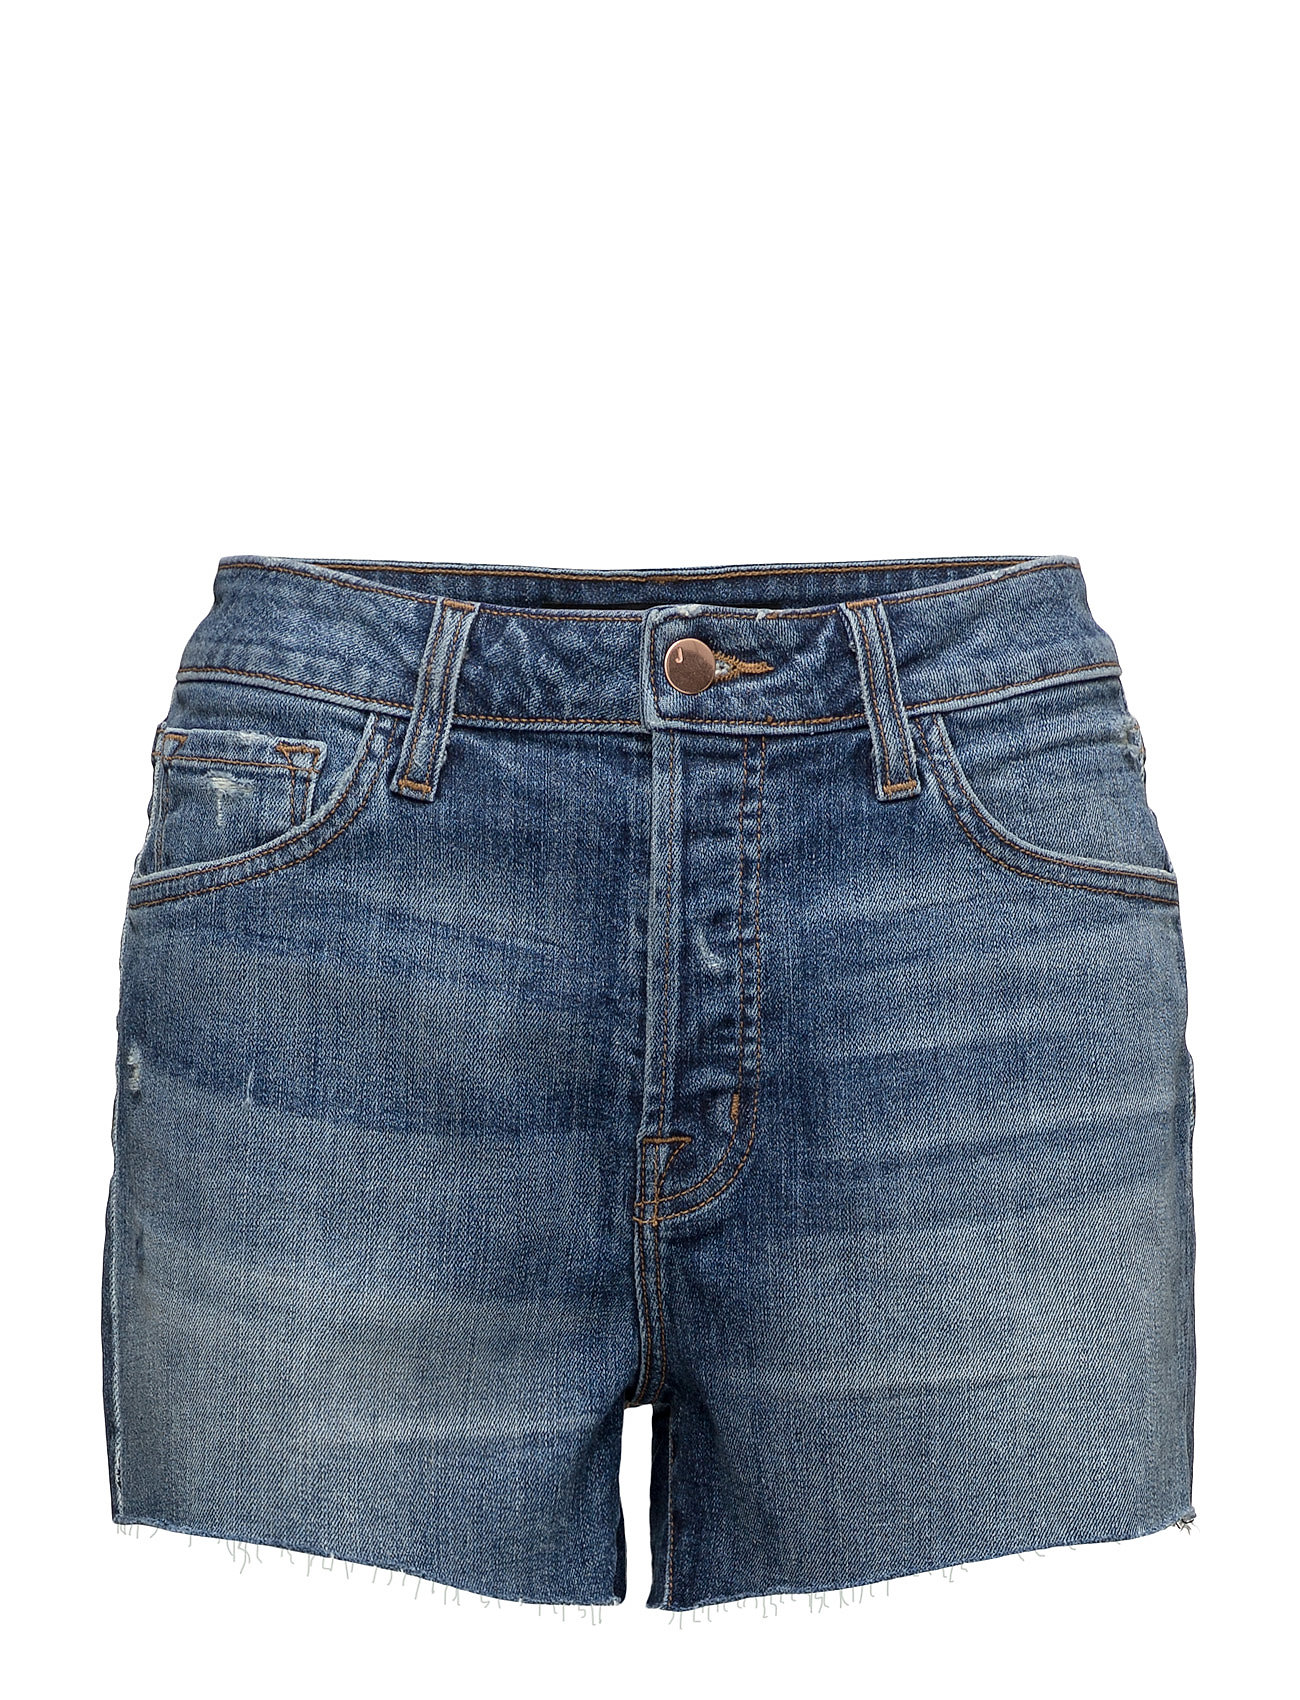 j brand – T155raw gracie high rise short fra boozt.com dk